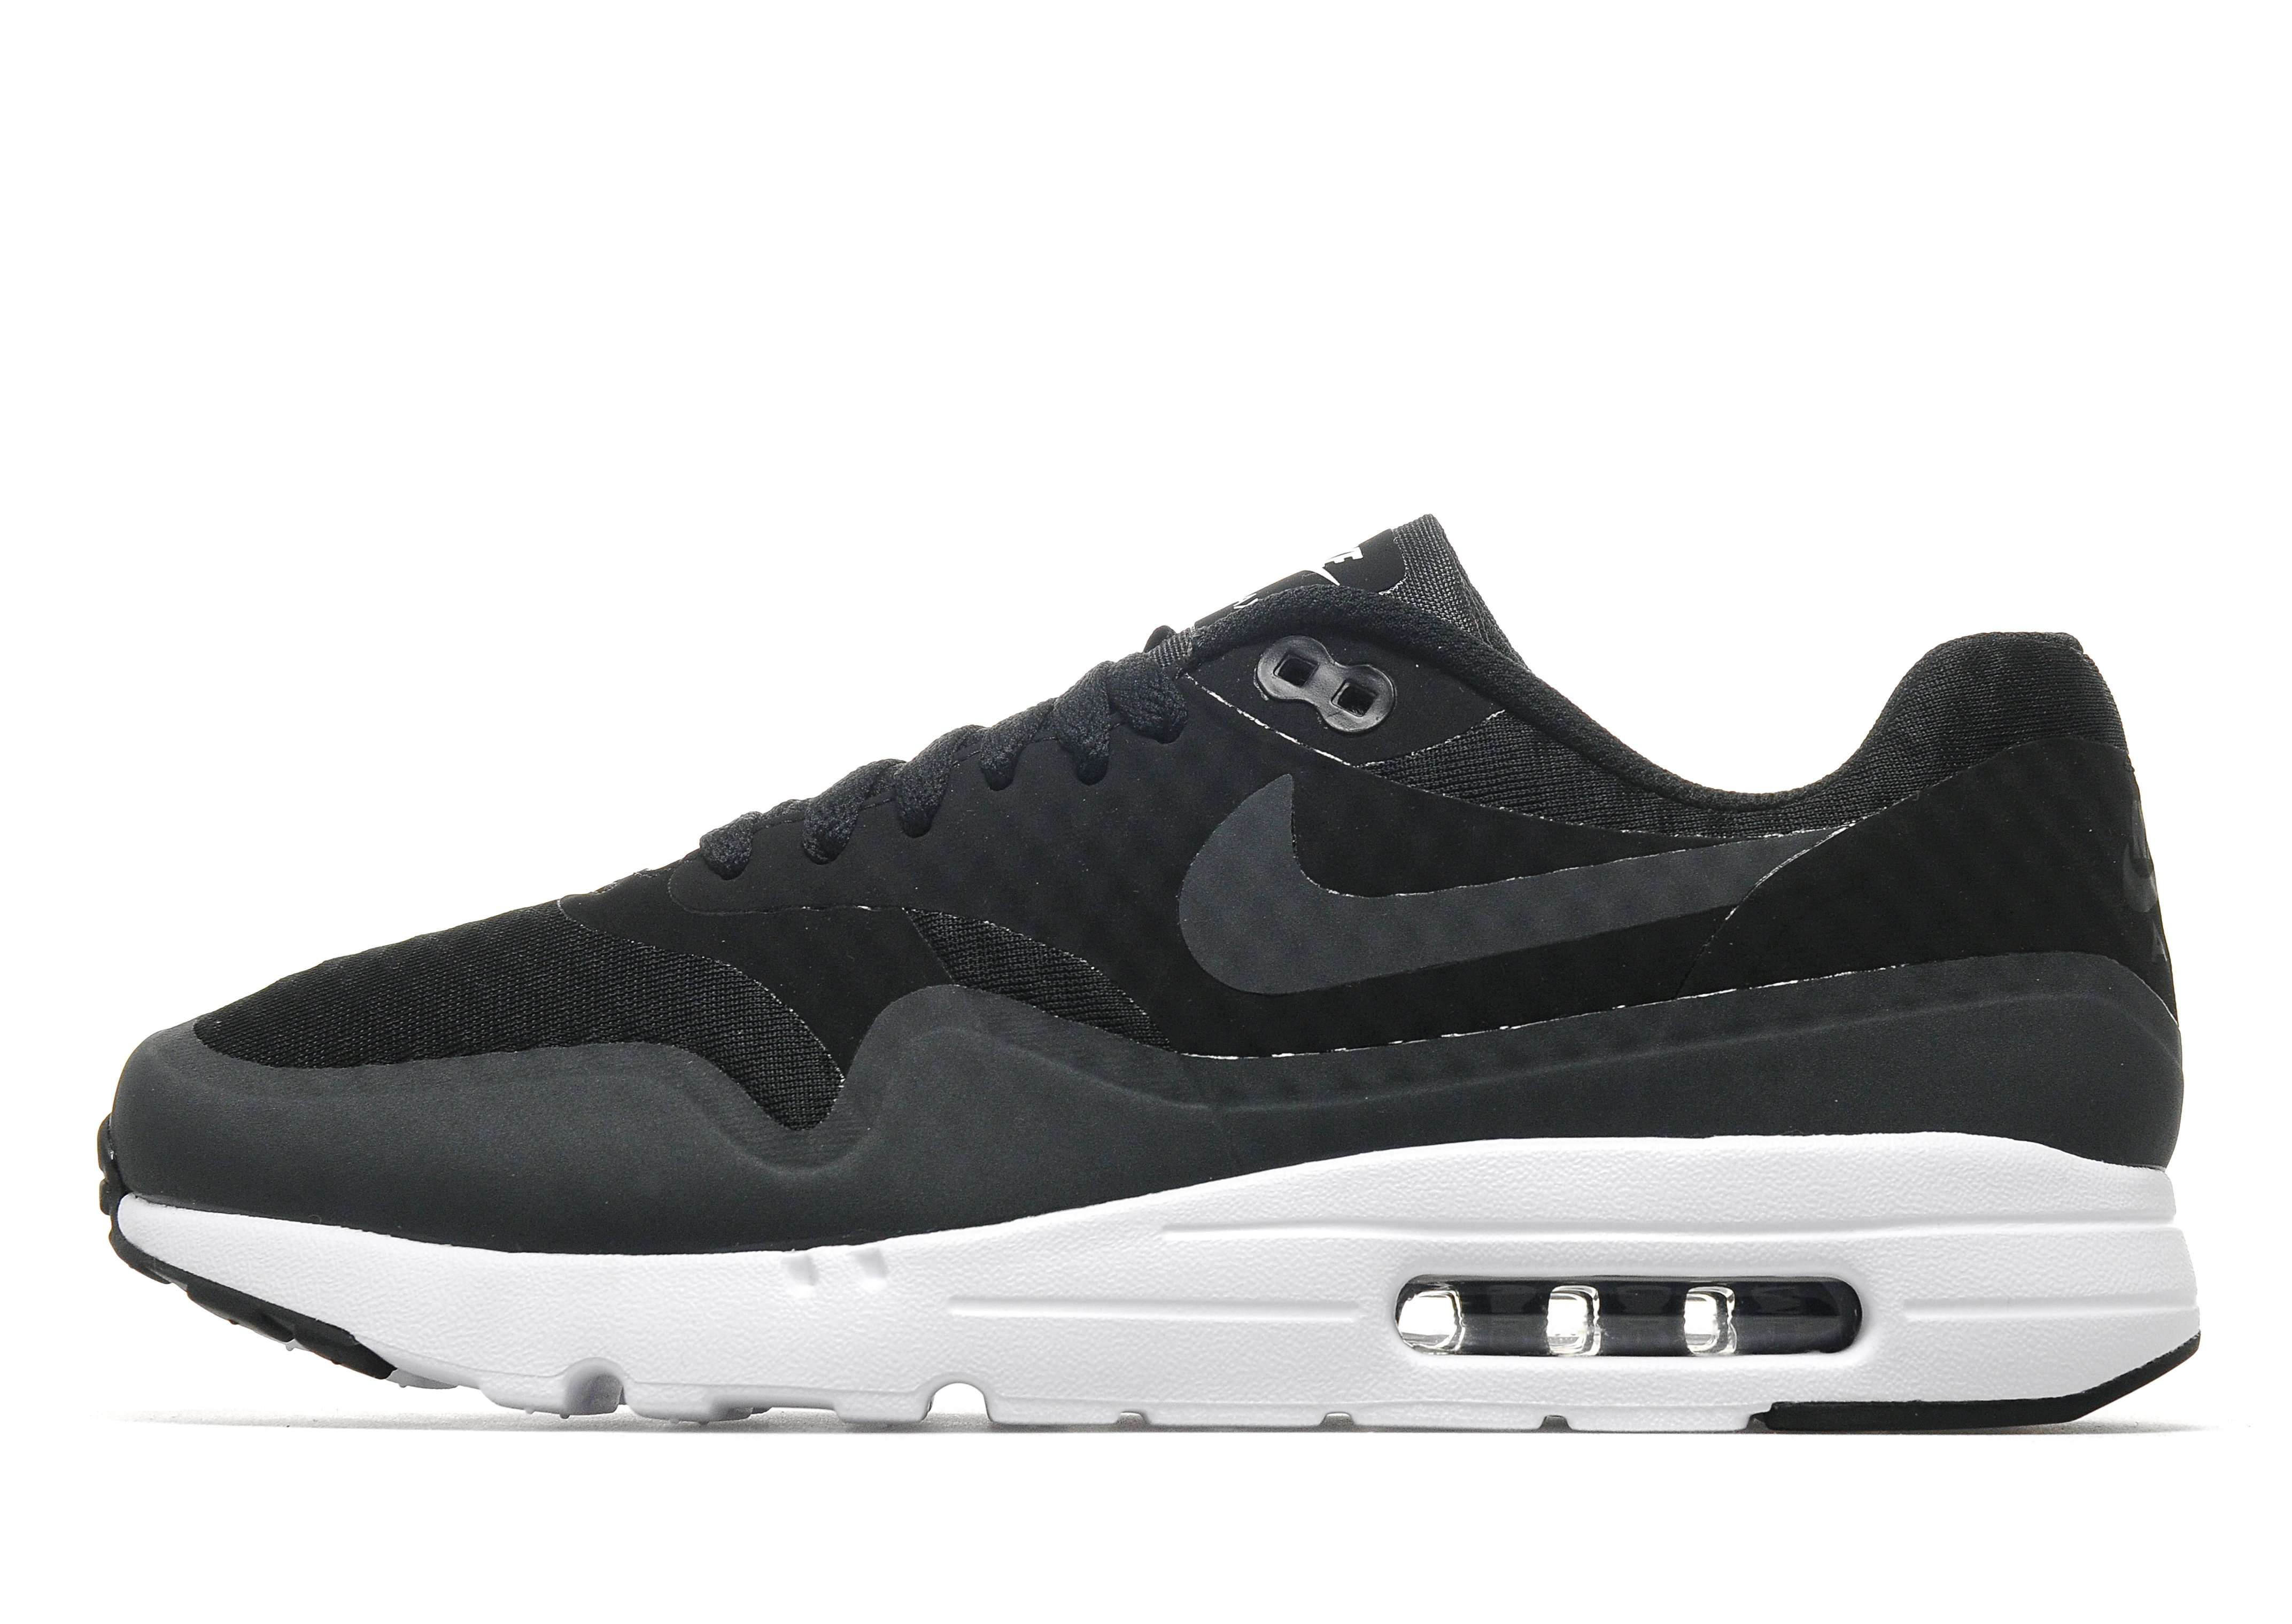 Air Max Nike Black